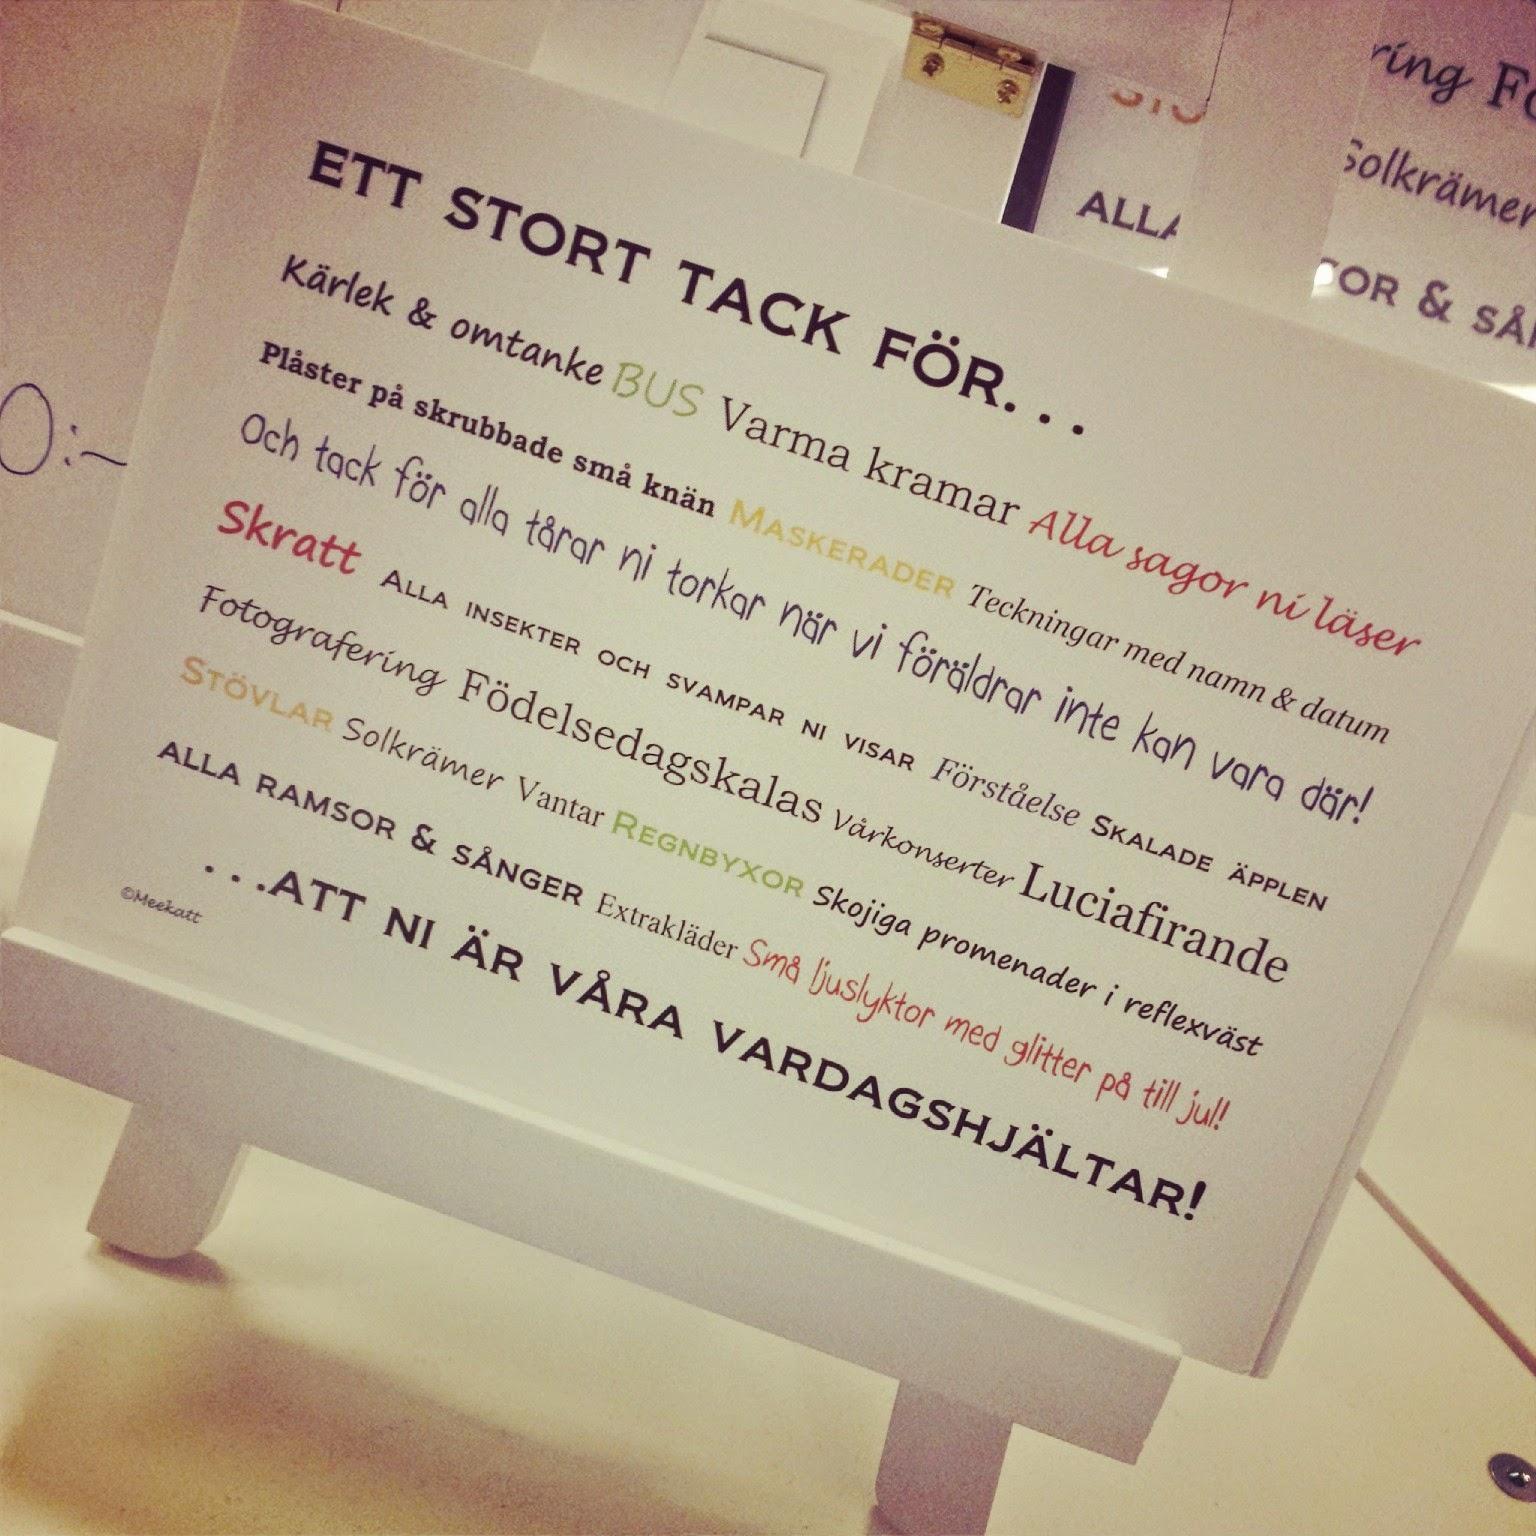 http://www.yourvismawebsite.com/birgersson-malin/shop/product/vardagshjaltar-3040-cm?tm=webshop